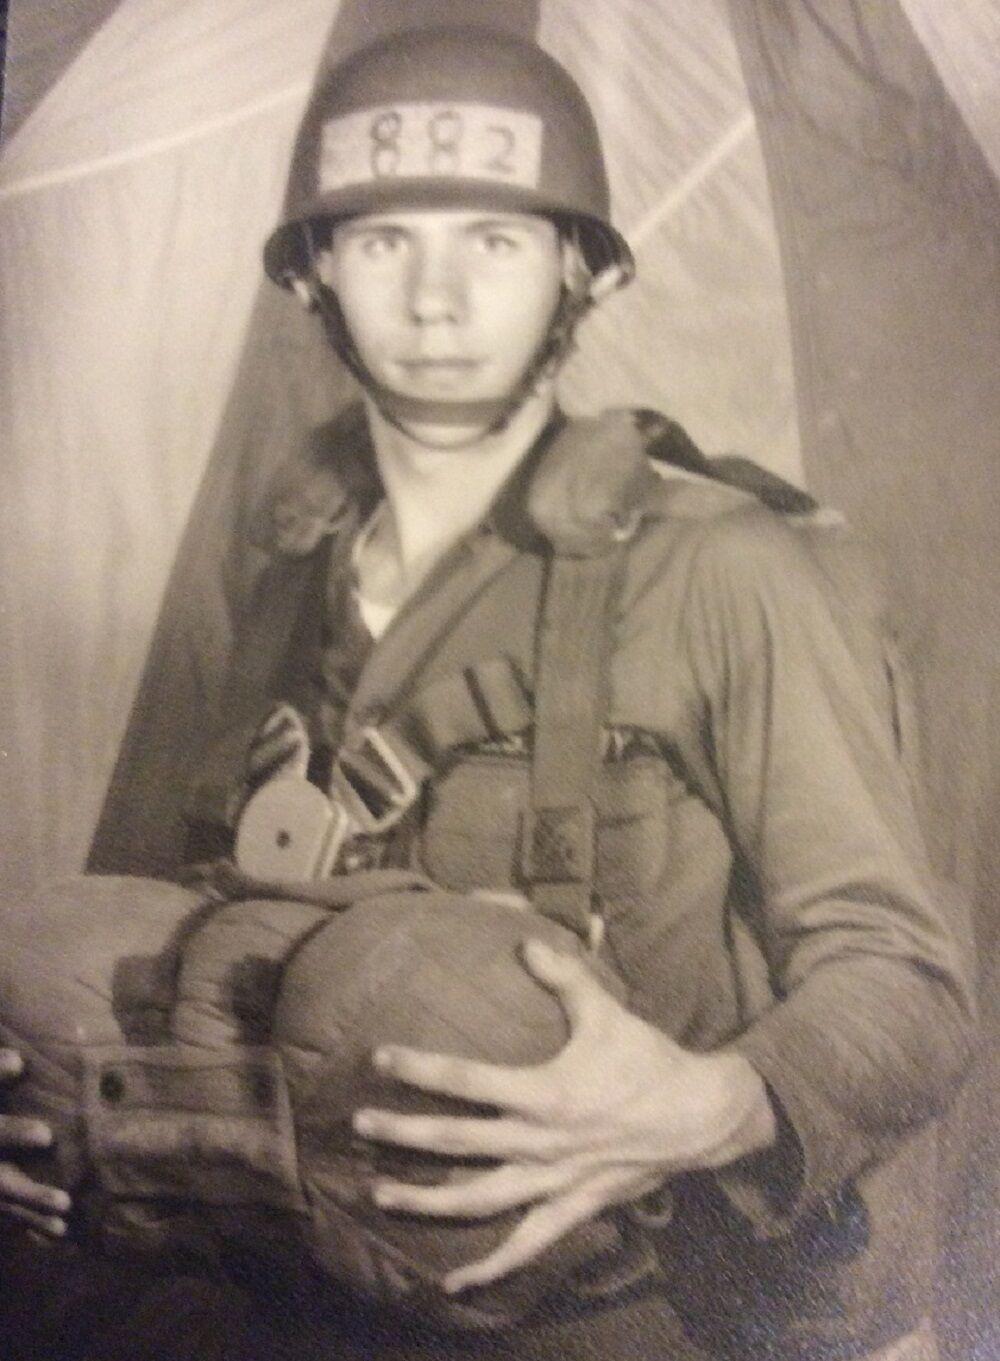 Vietnam vet John Kennedy 2 Soldier.jpg